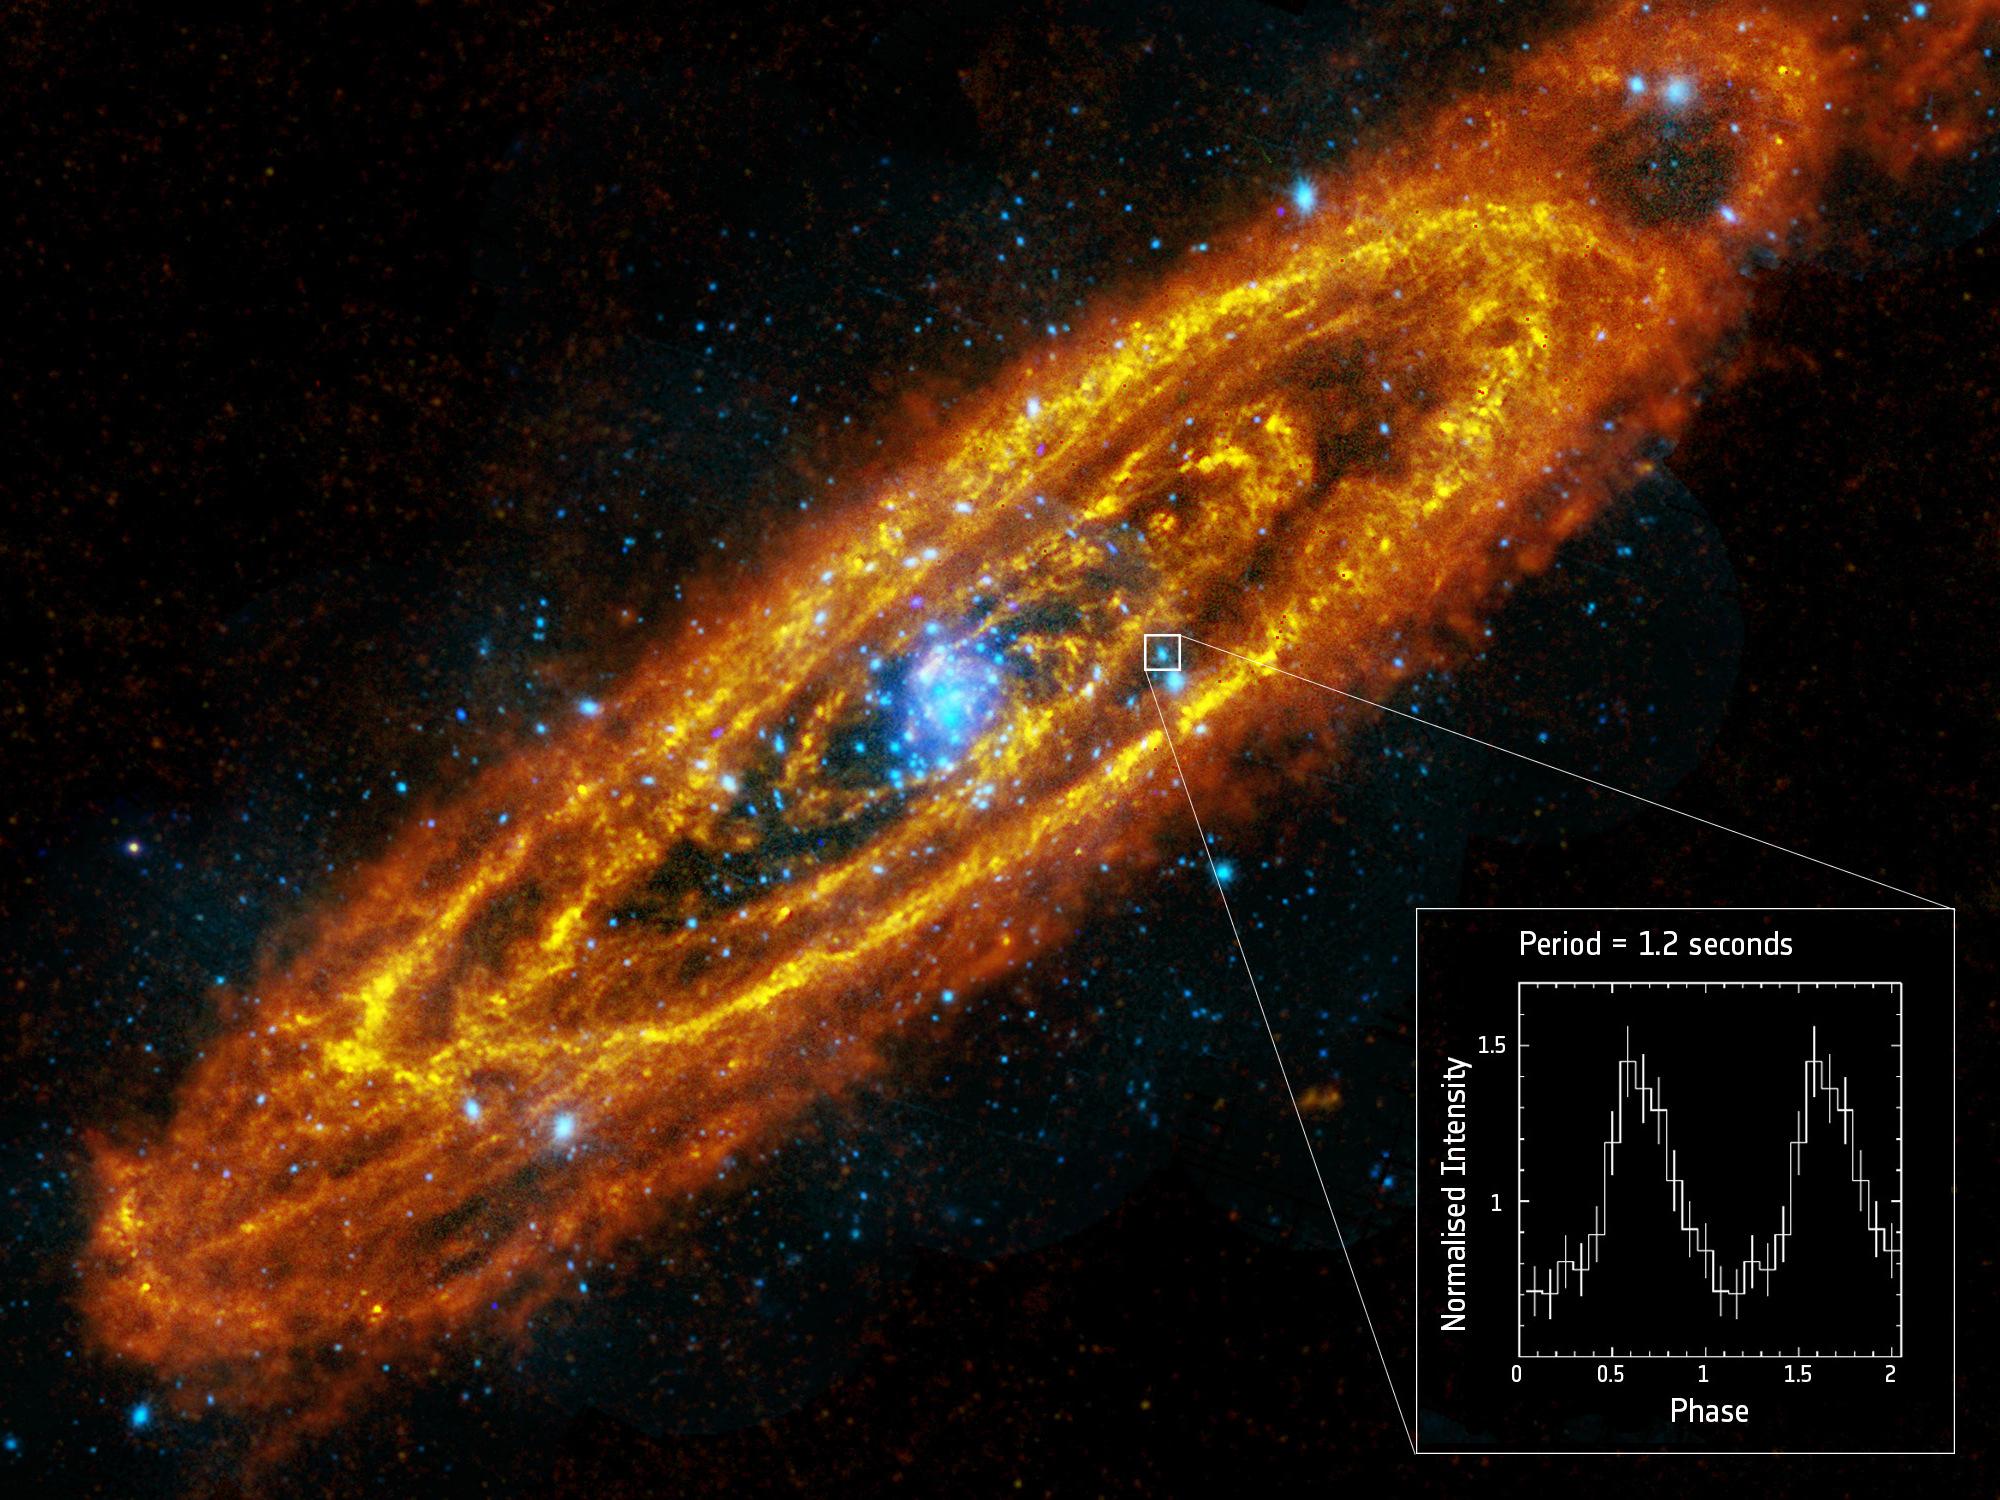 Windows Rotating Wallpaper Fall Andromeda Galaxy S First Spinning Neutron Star Found